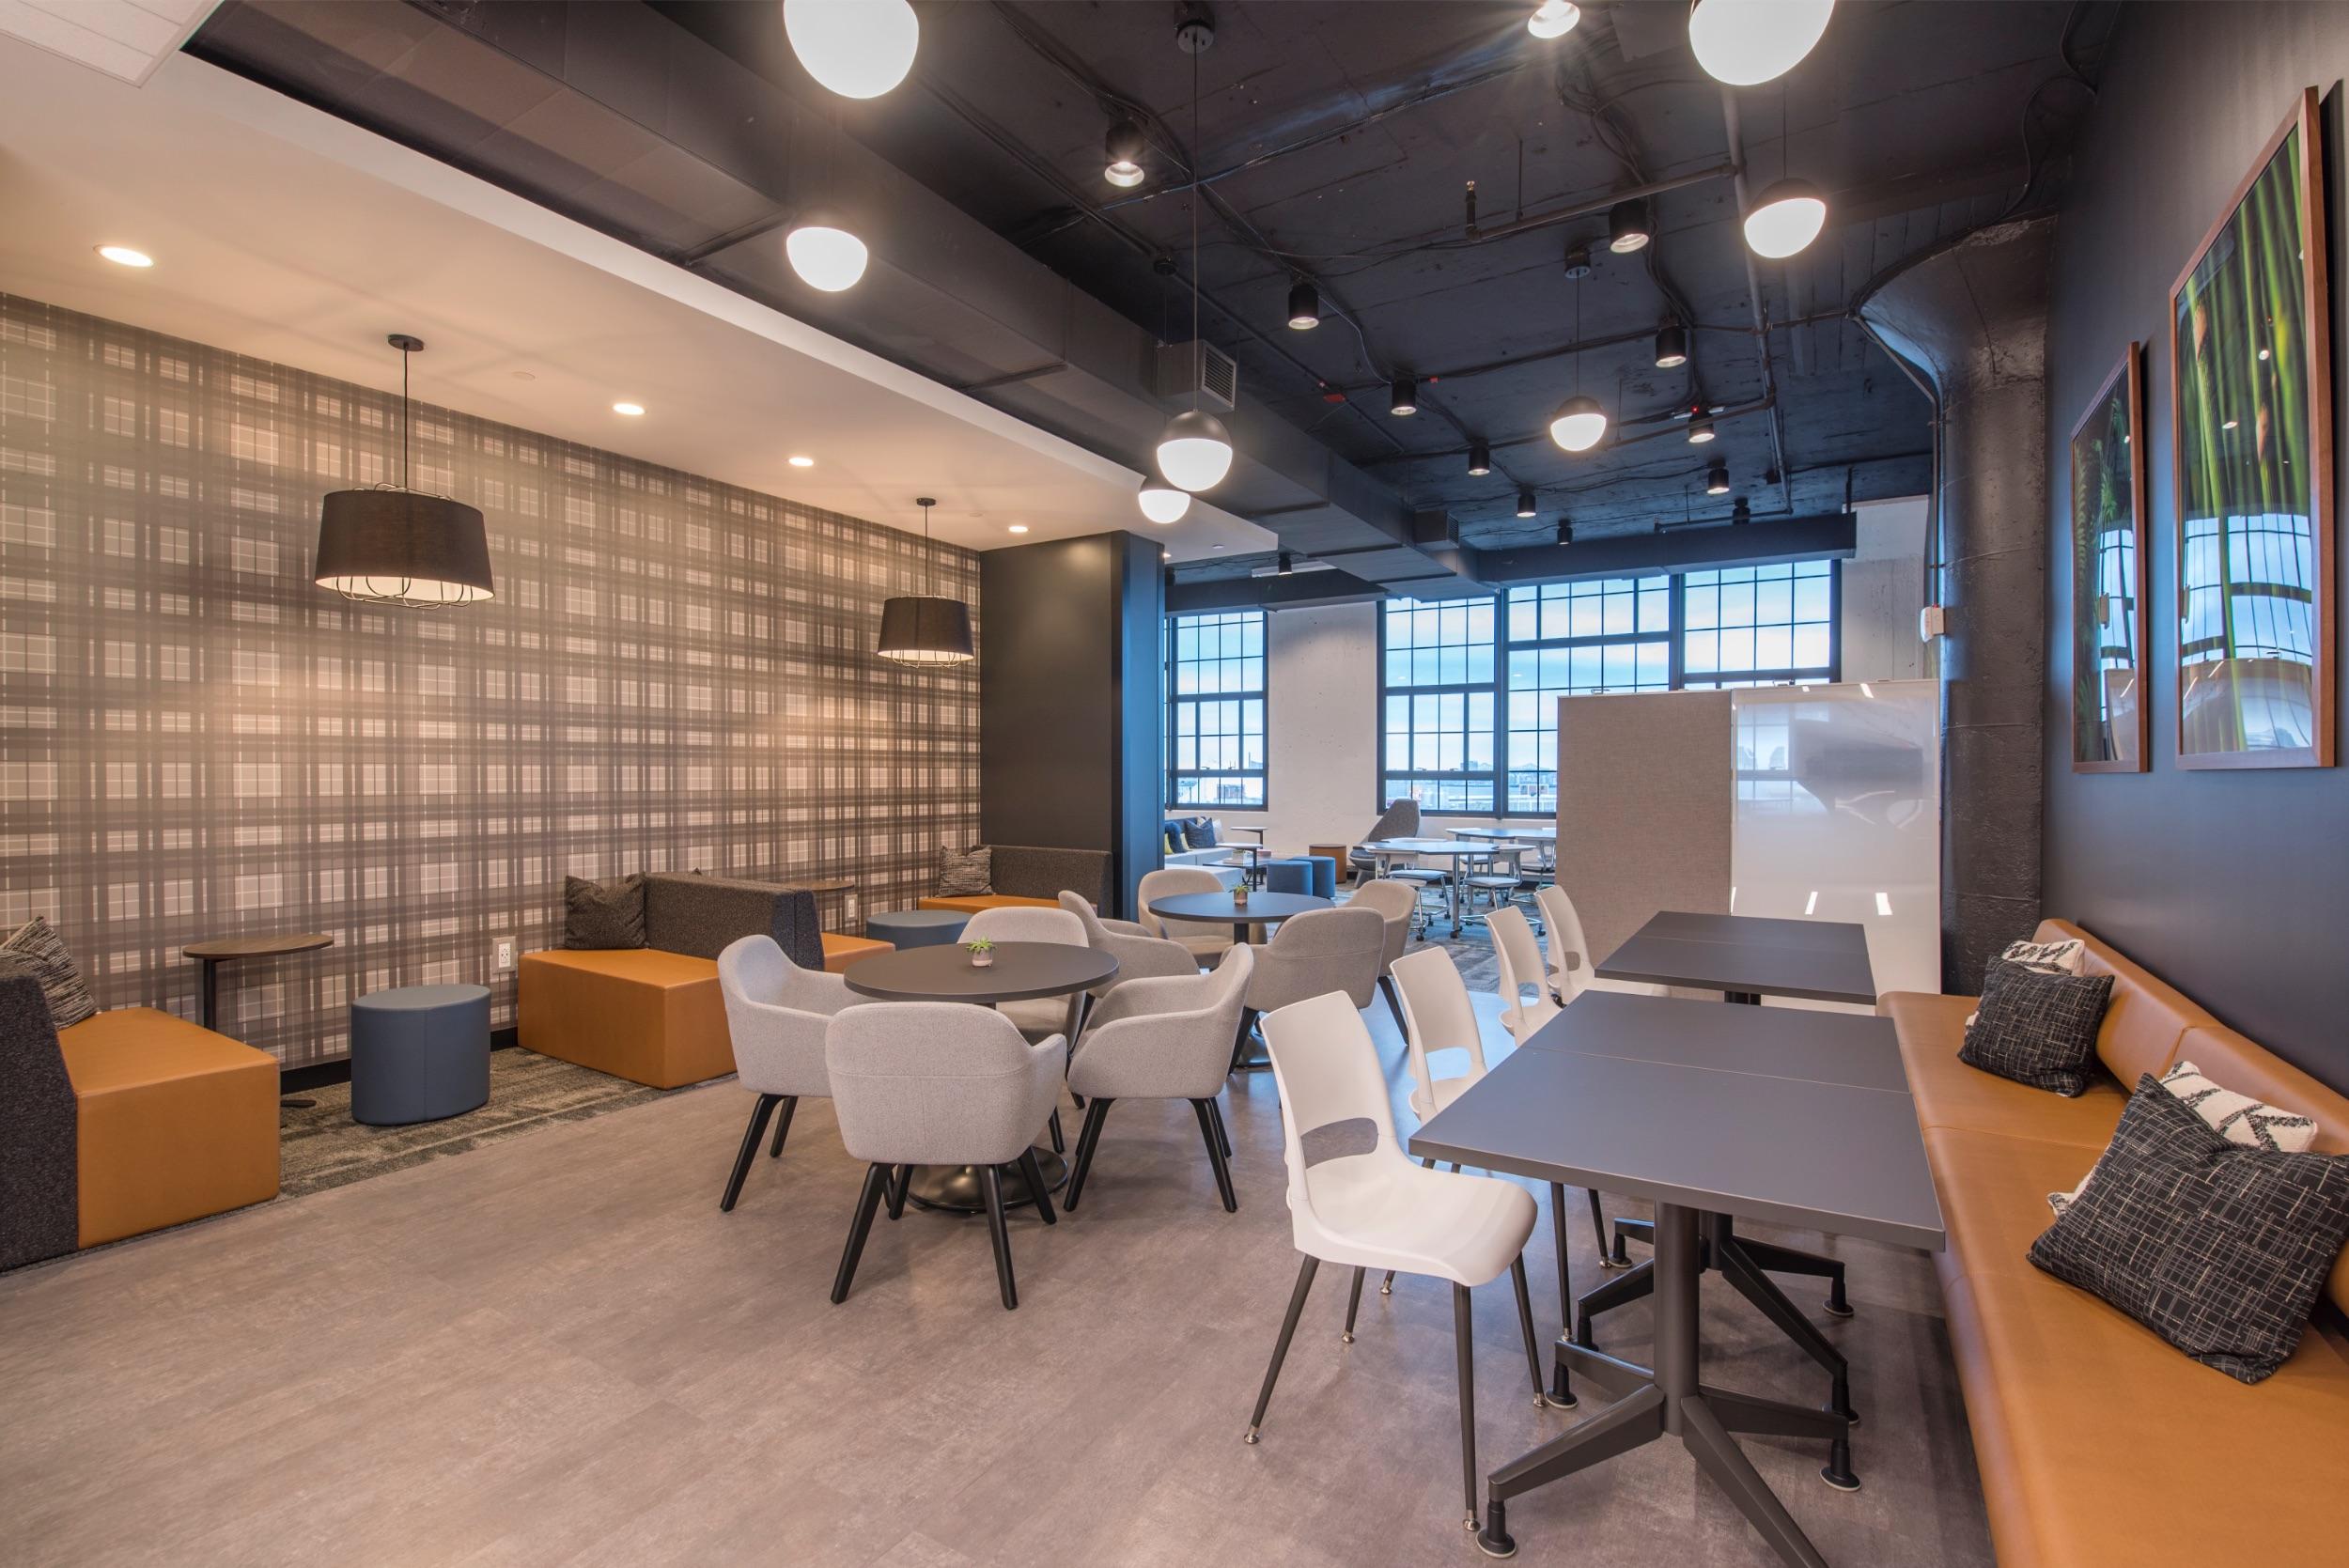 Corderman_Construction_KI_Showroom_Boston_Design_Center_Furniture_Seating.jpg